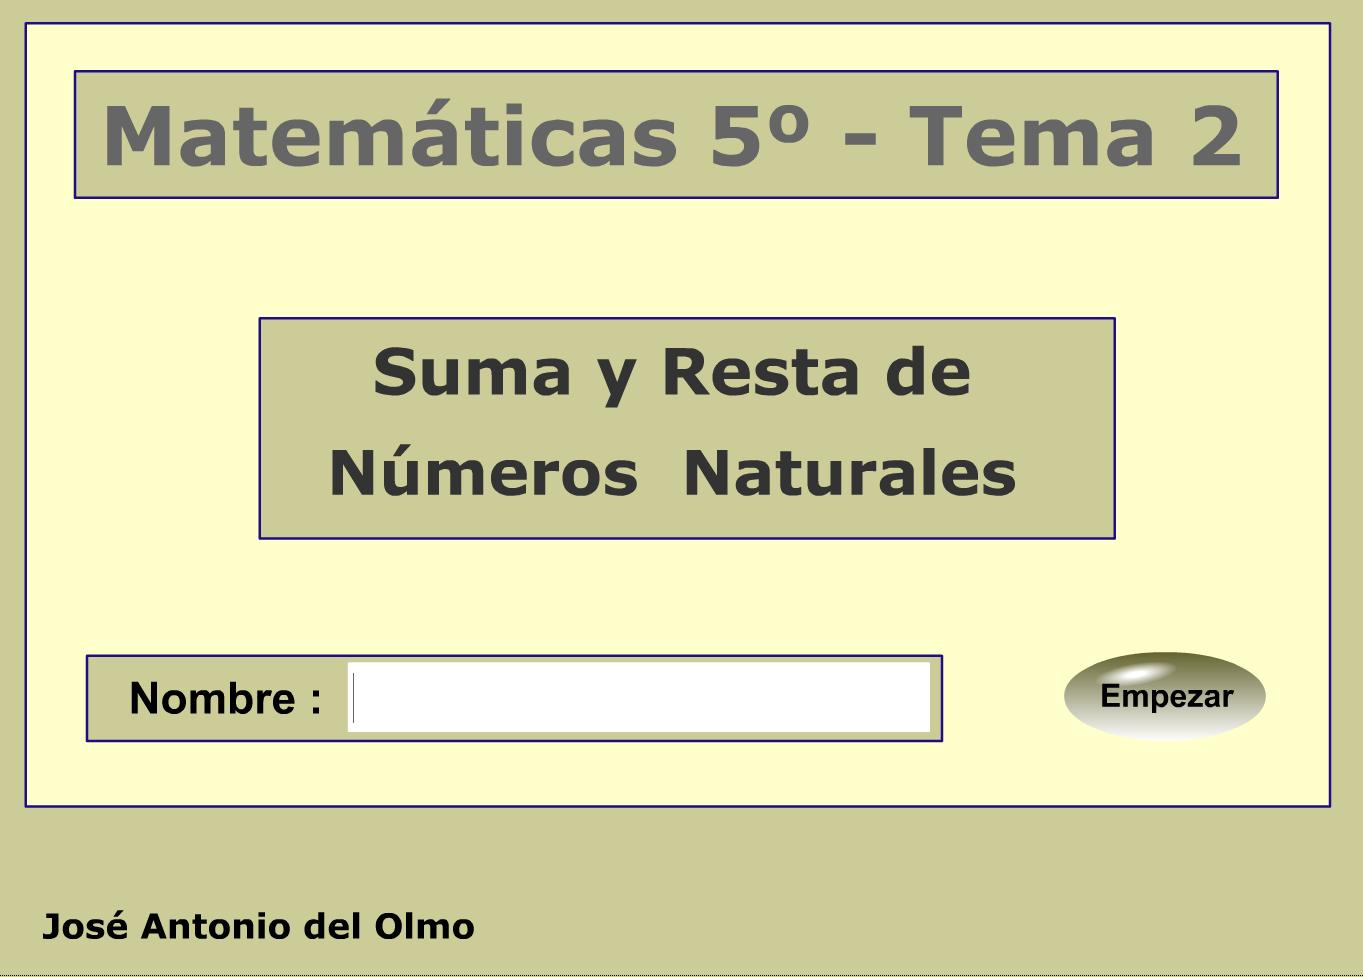 http://www.ceiploreto.es/sugerencias/averroes/educativa/Mat_5_2_sumayresta.html